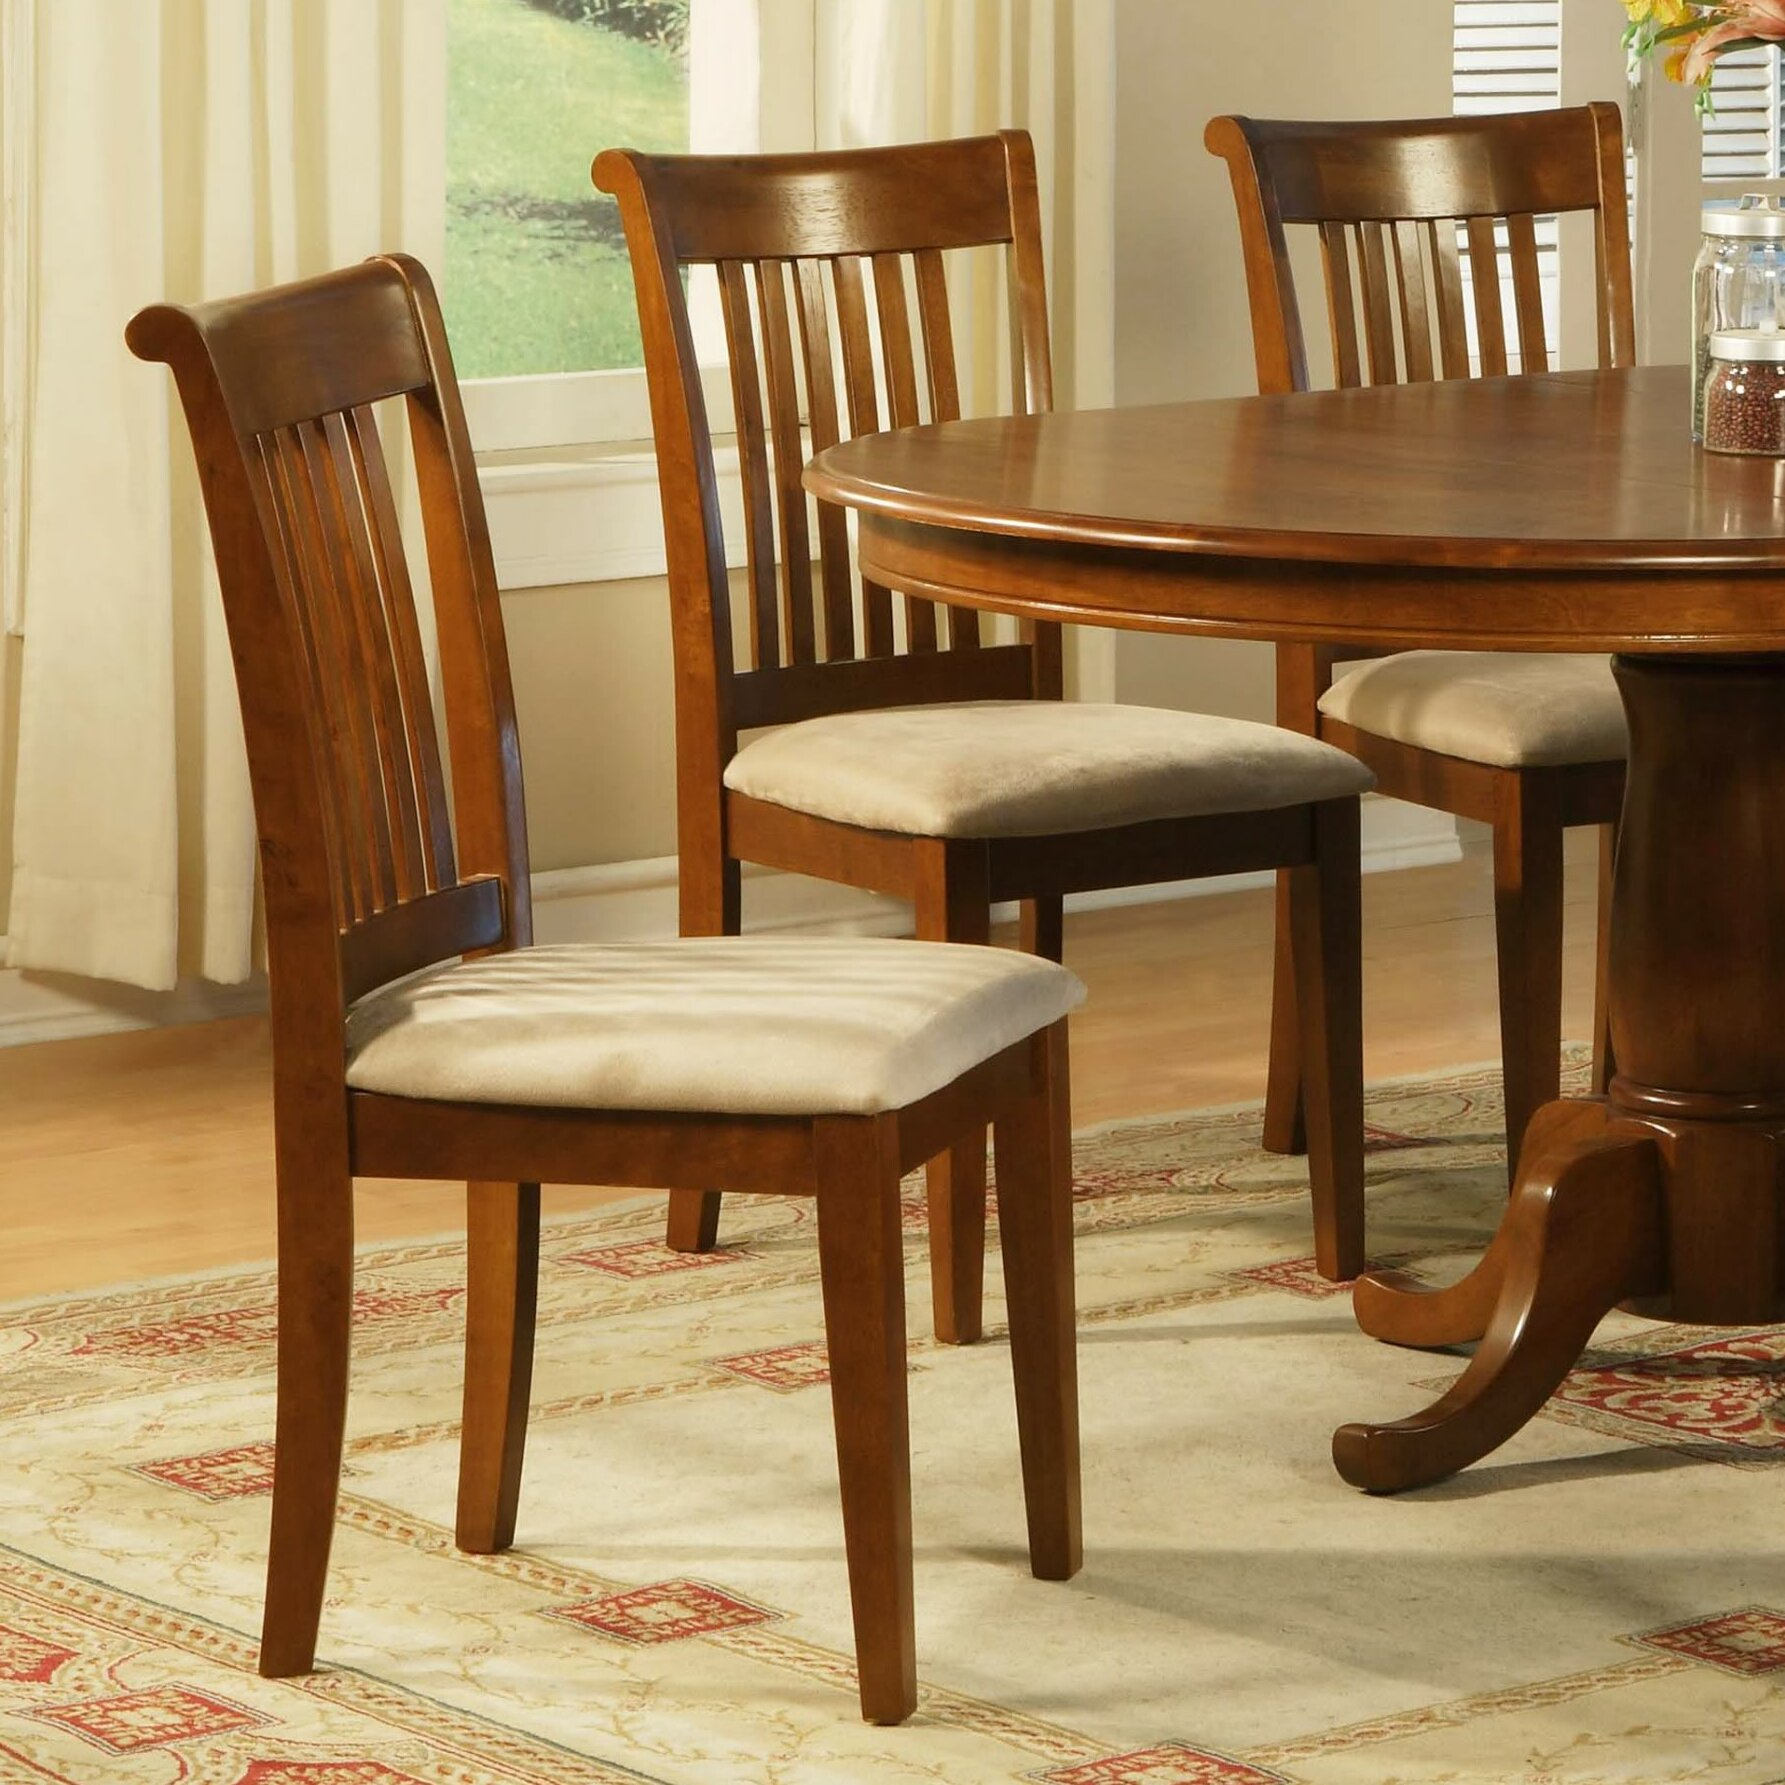 Wayfair Com Furniture: East West Portland Side Chair & Reviews